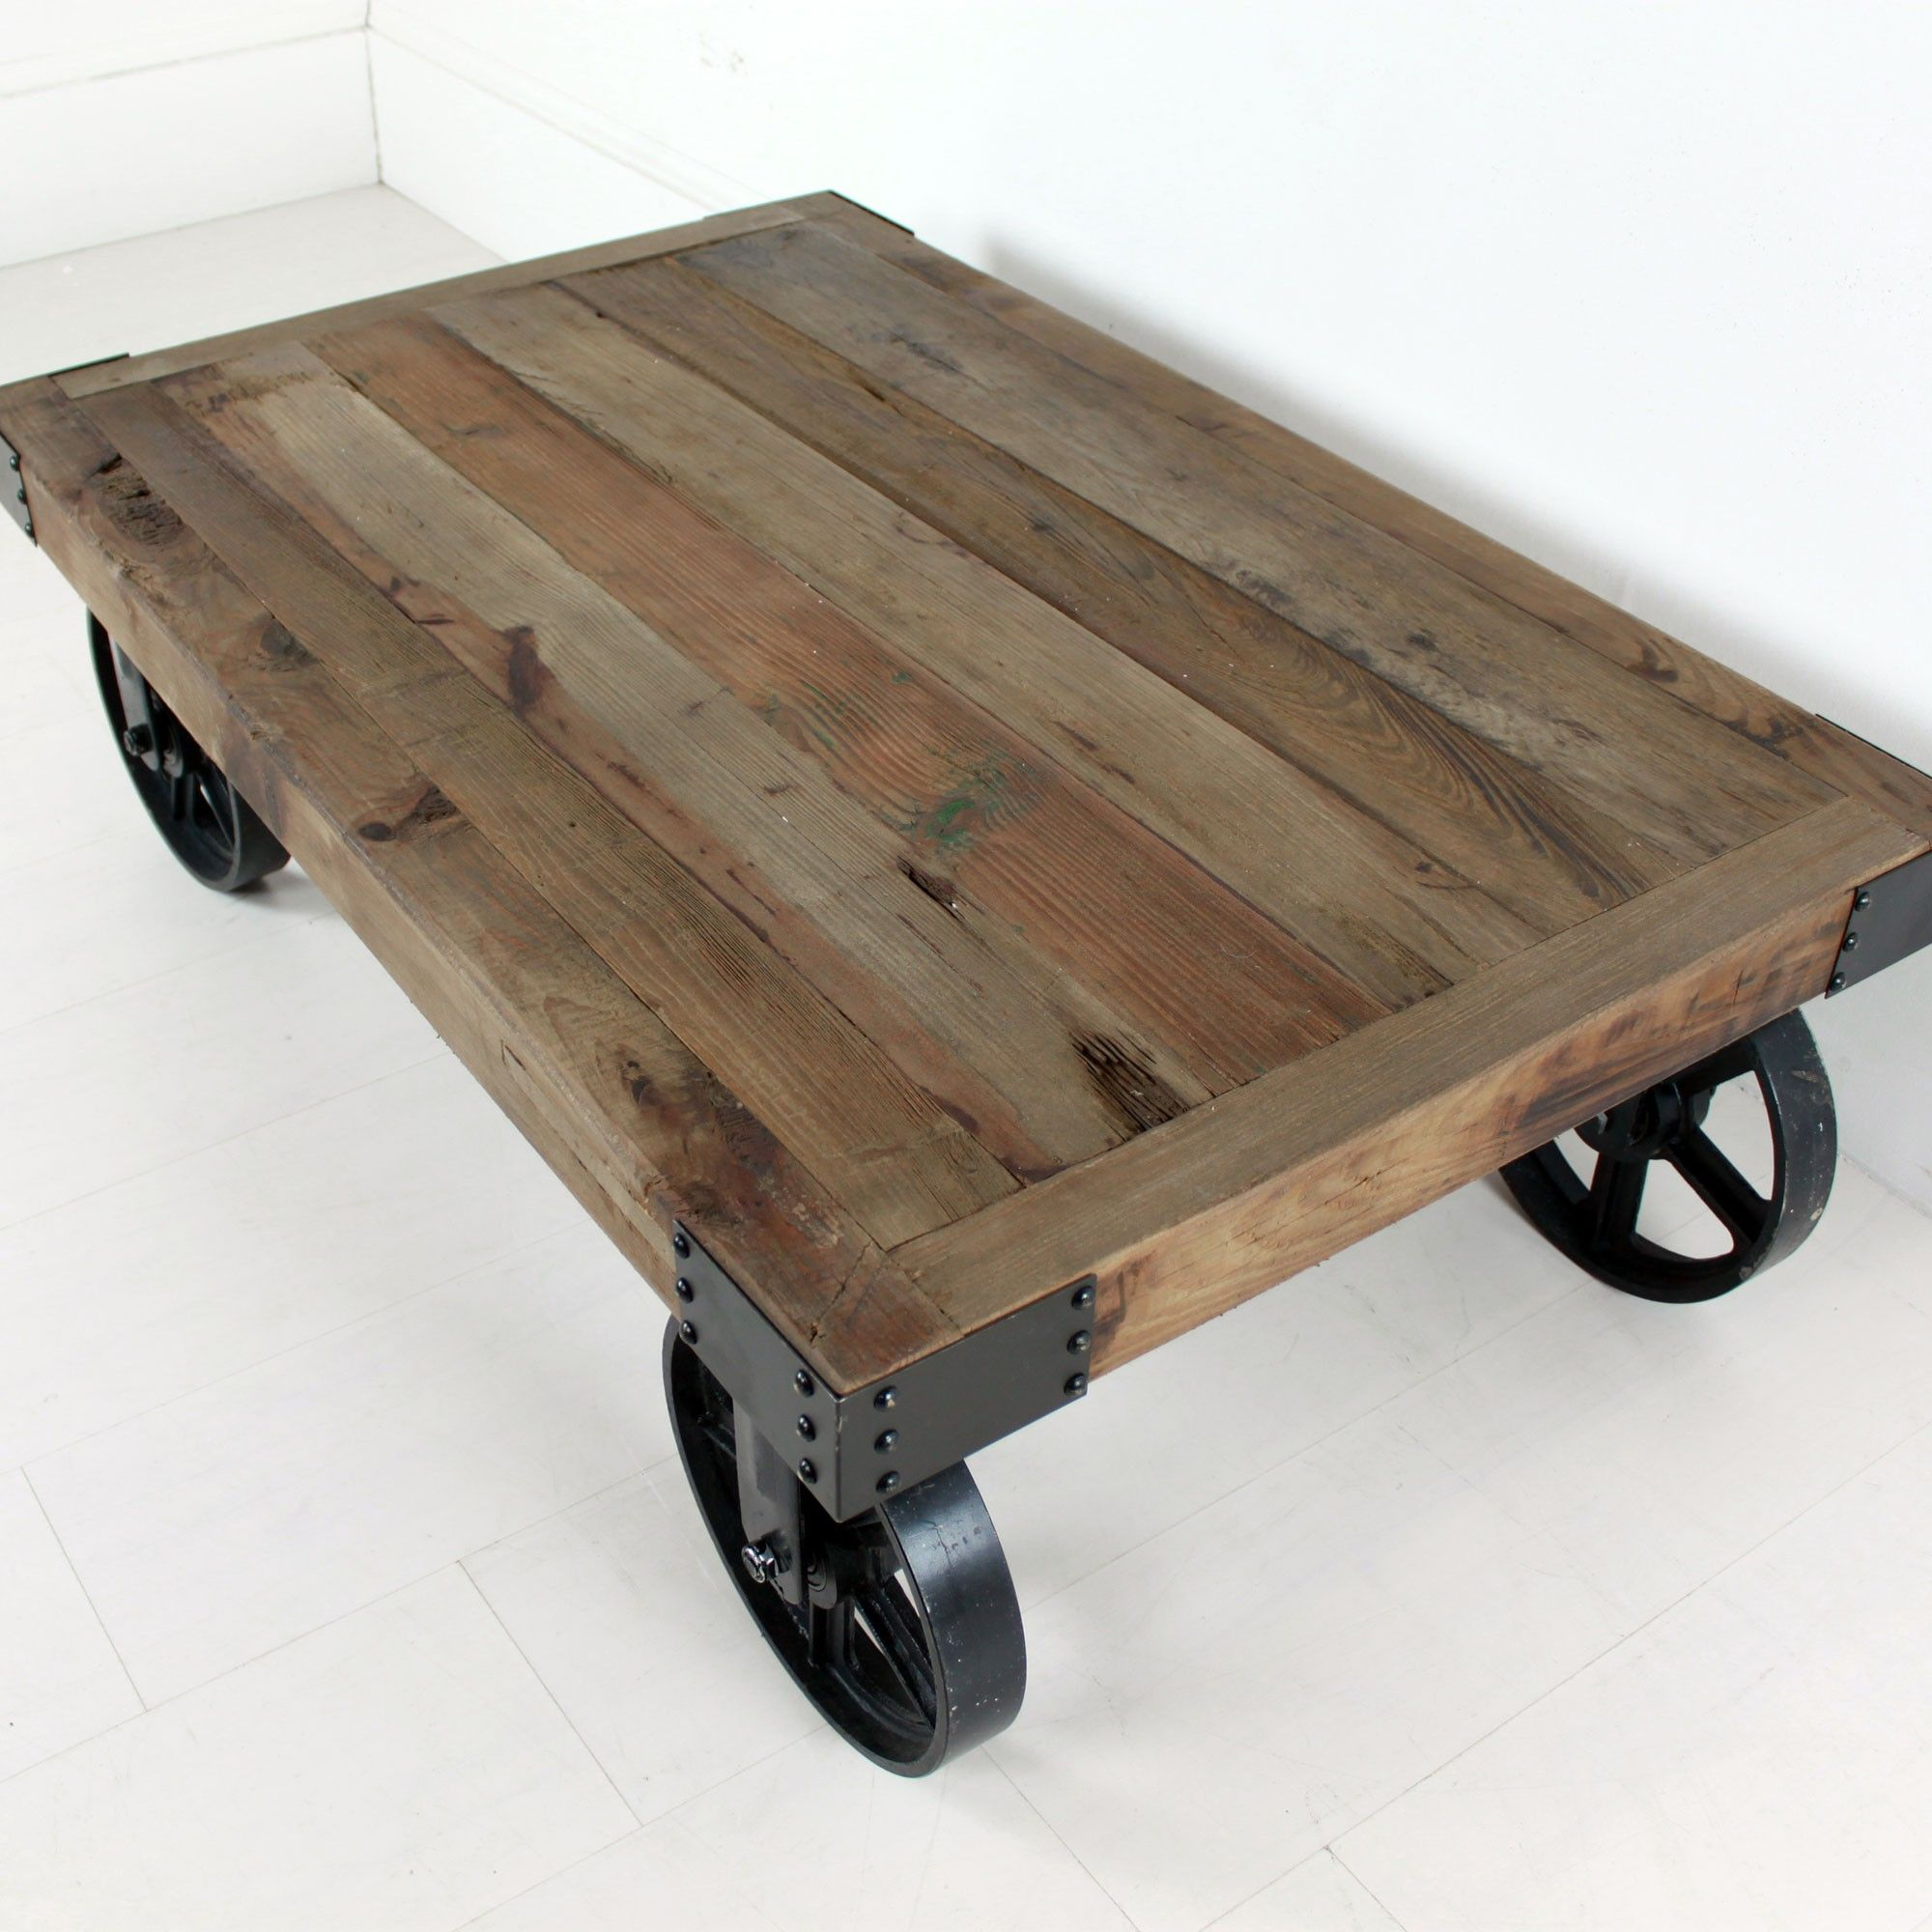 Industrial Coffee Table On Wheels Coffee Table With Wheels Rustic Coffee Tables Cart Coffee Table [ 2000 x 2000 Pixel ]